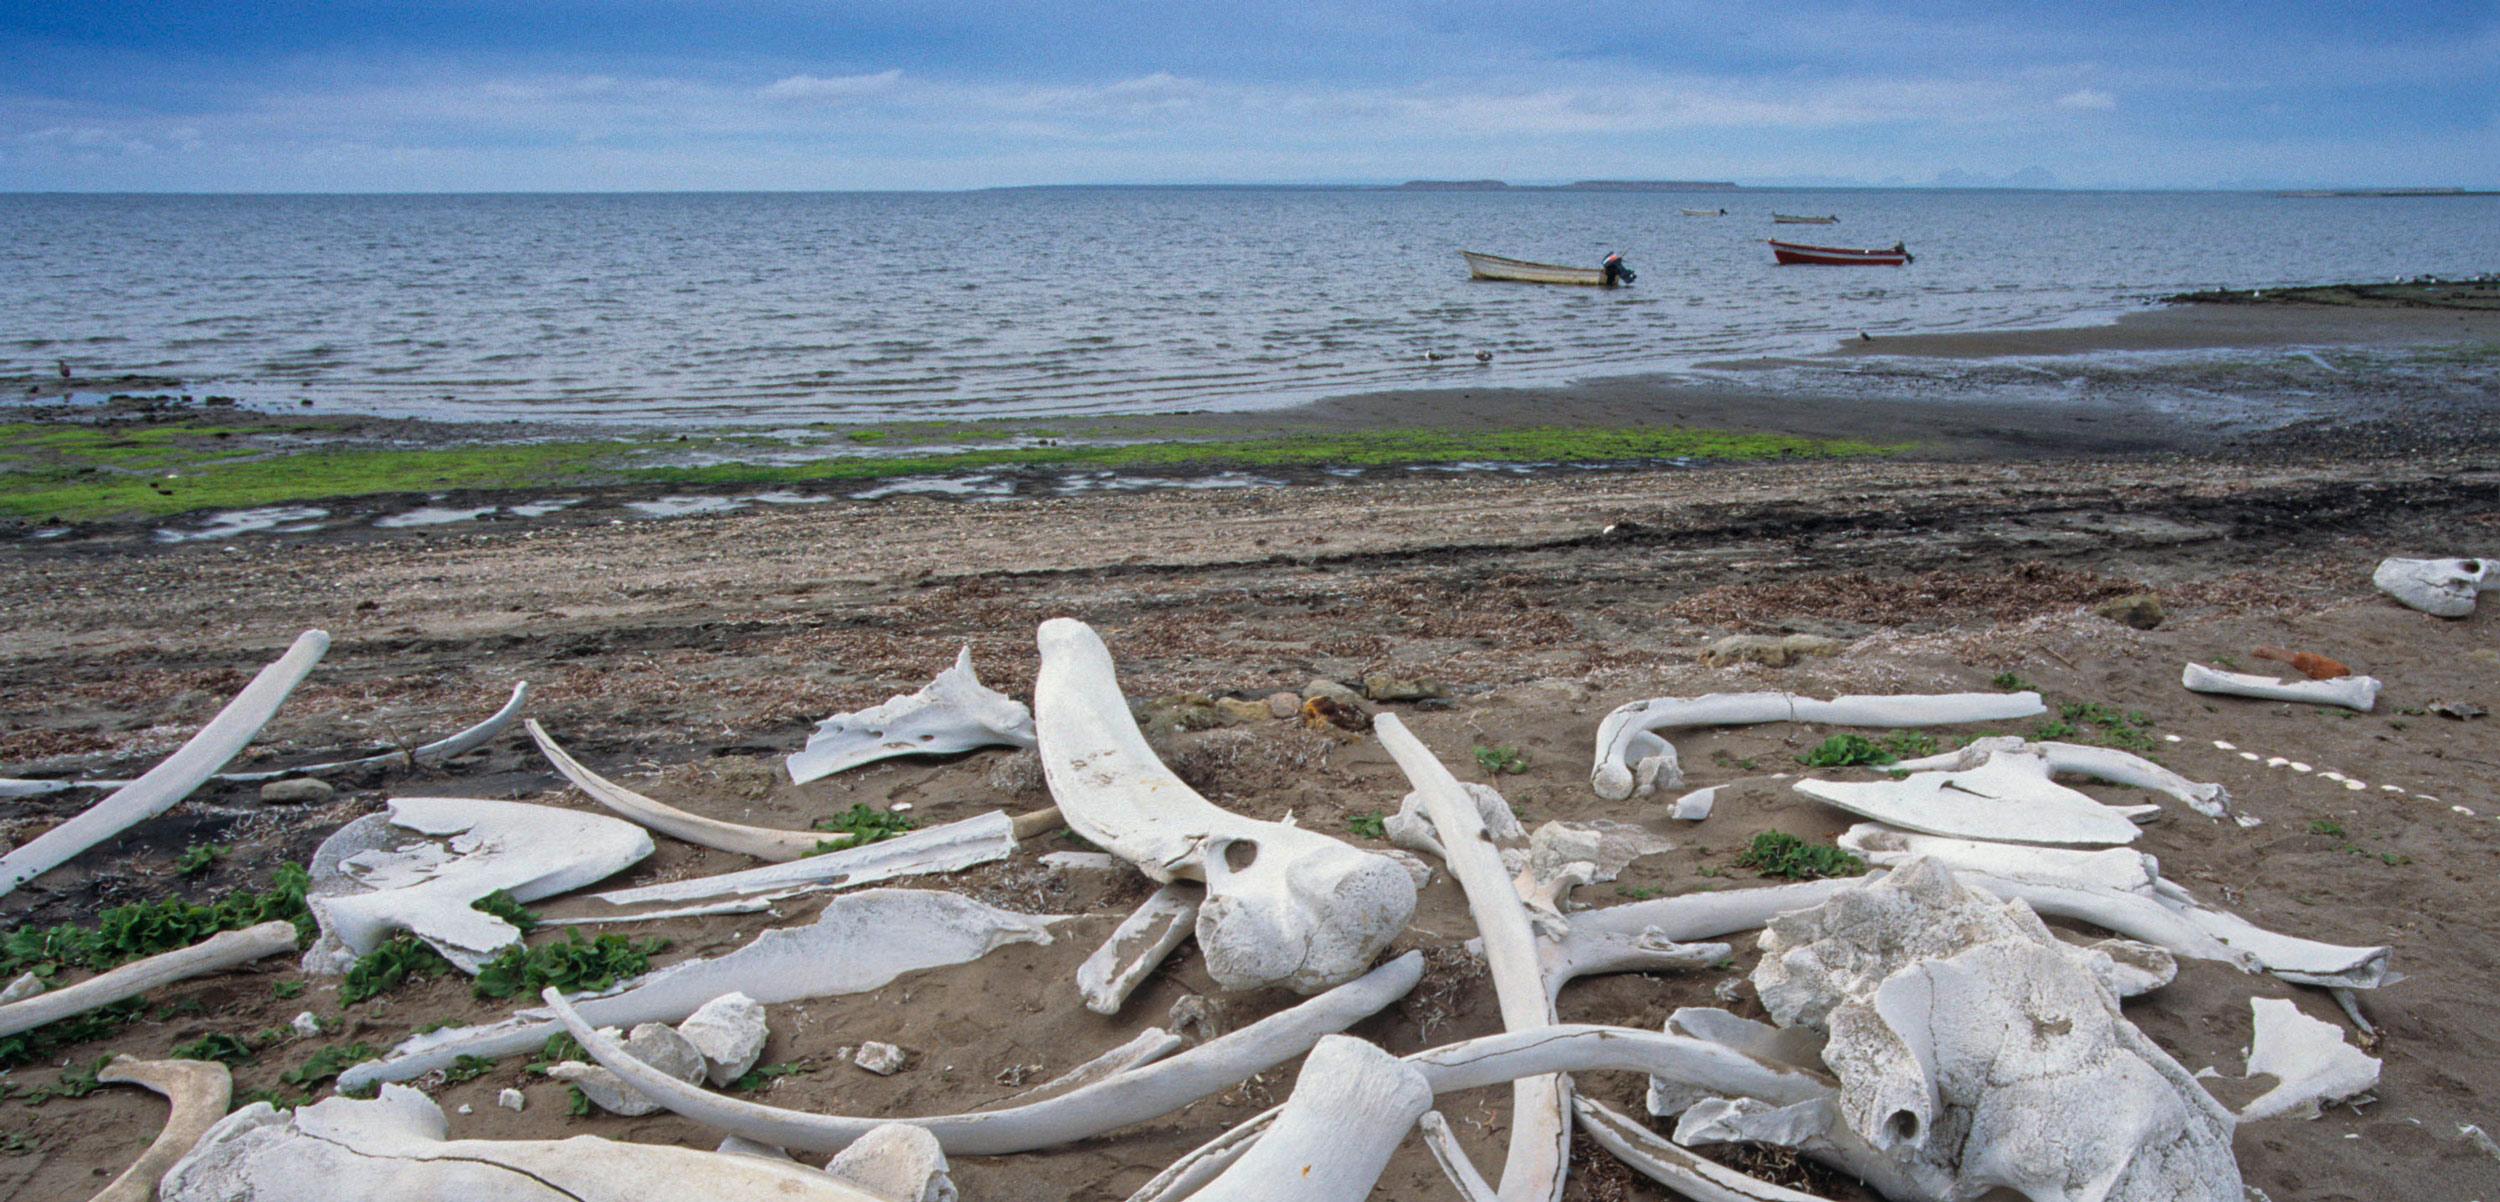 whale bones on beach, San Ignacio Lagoon, Baja California, Mexico